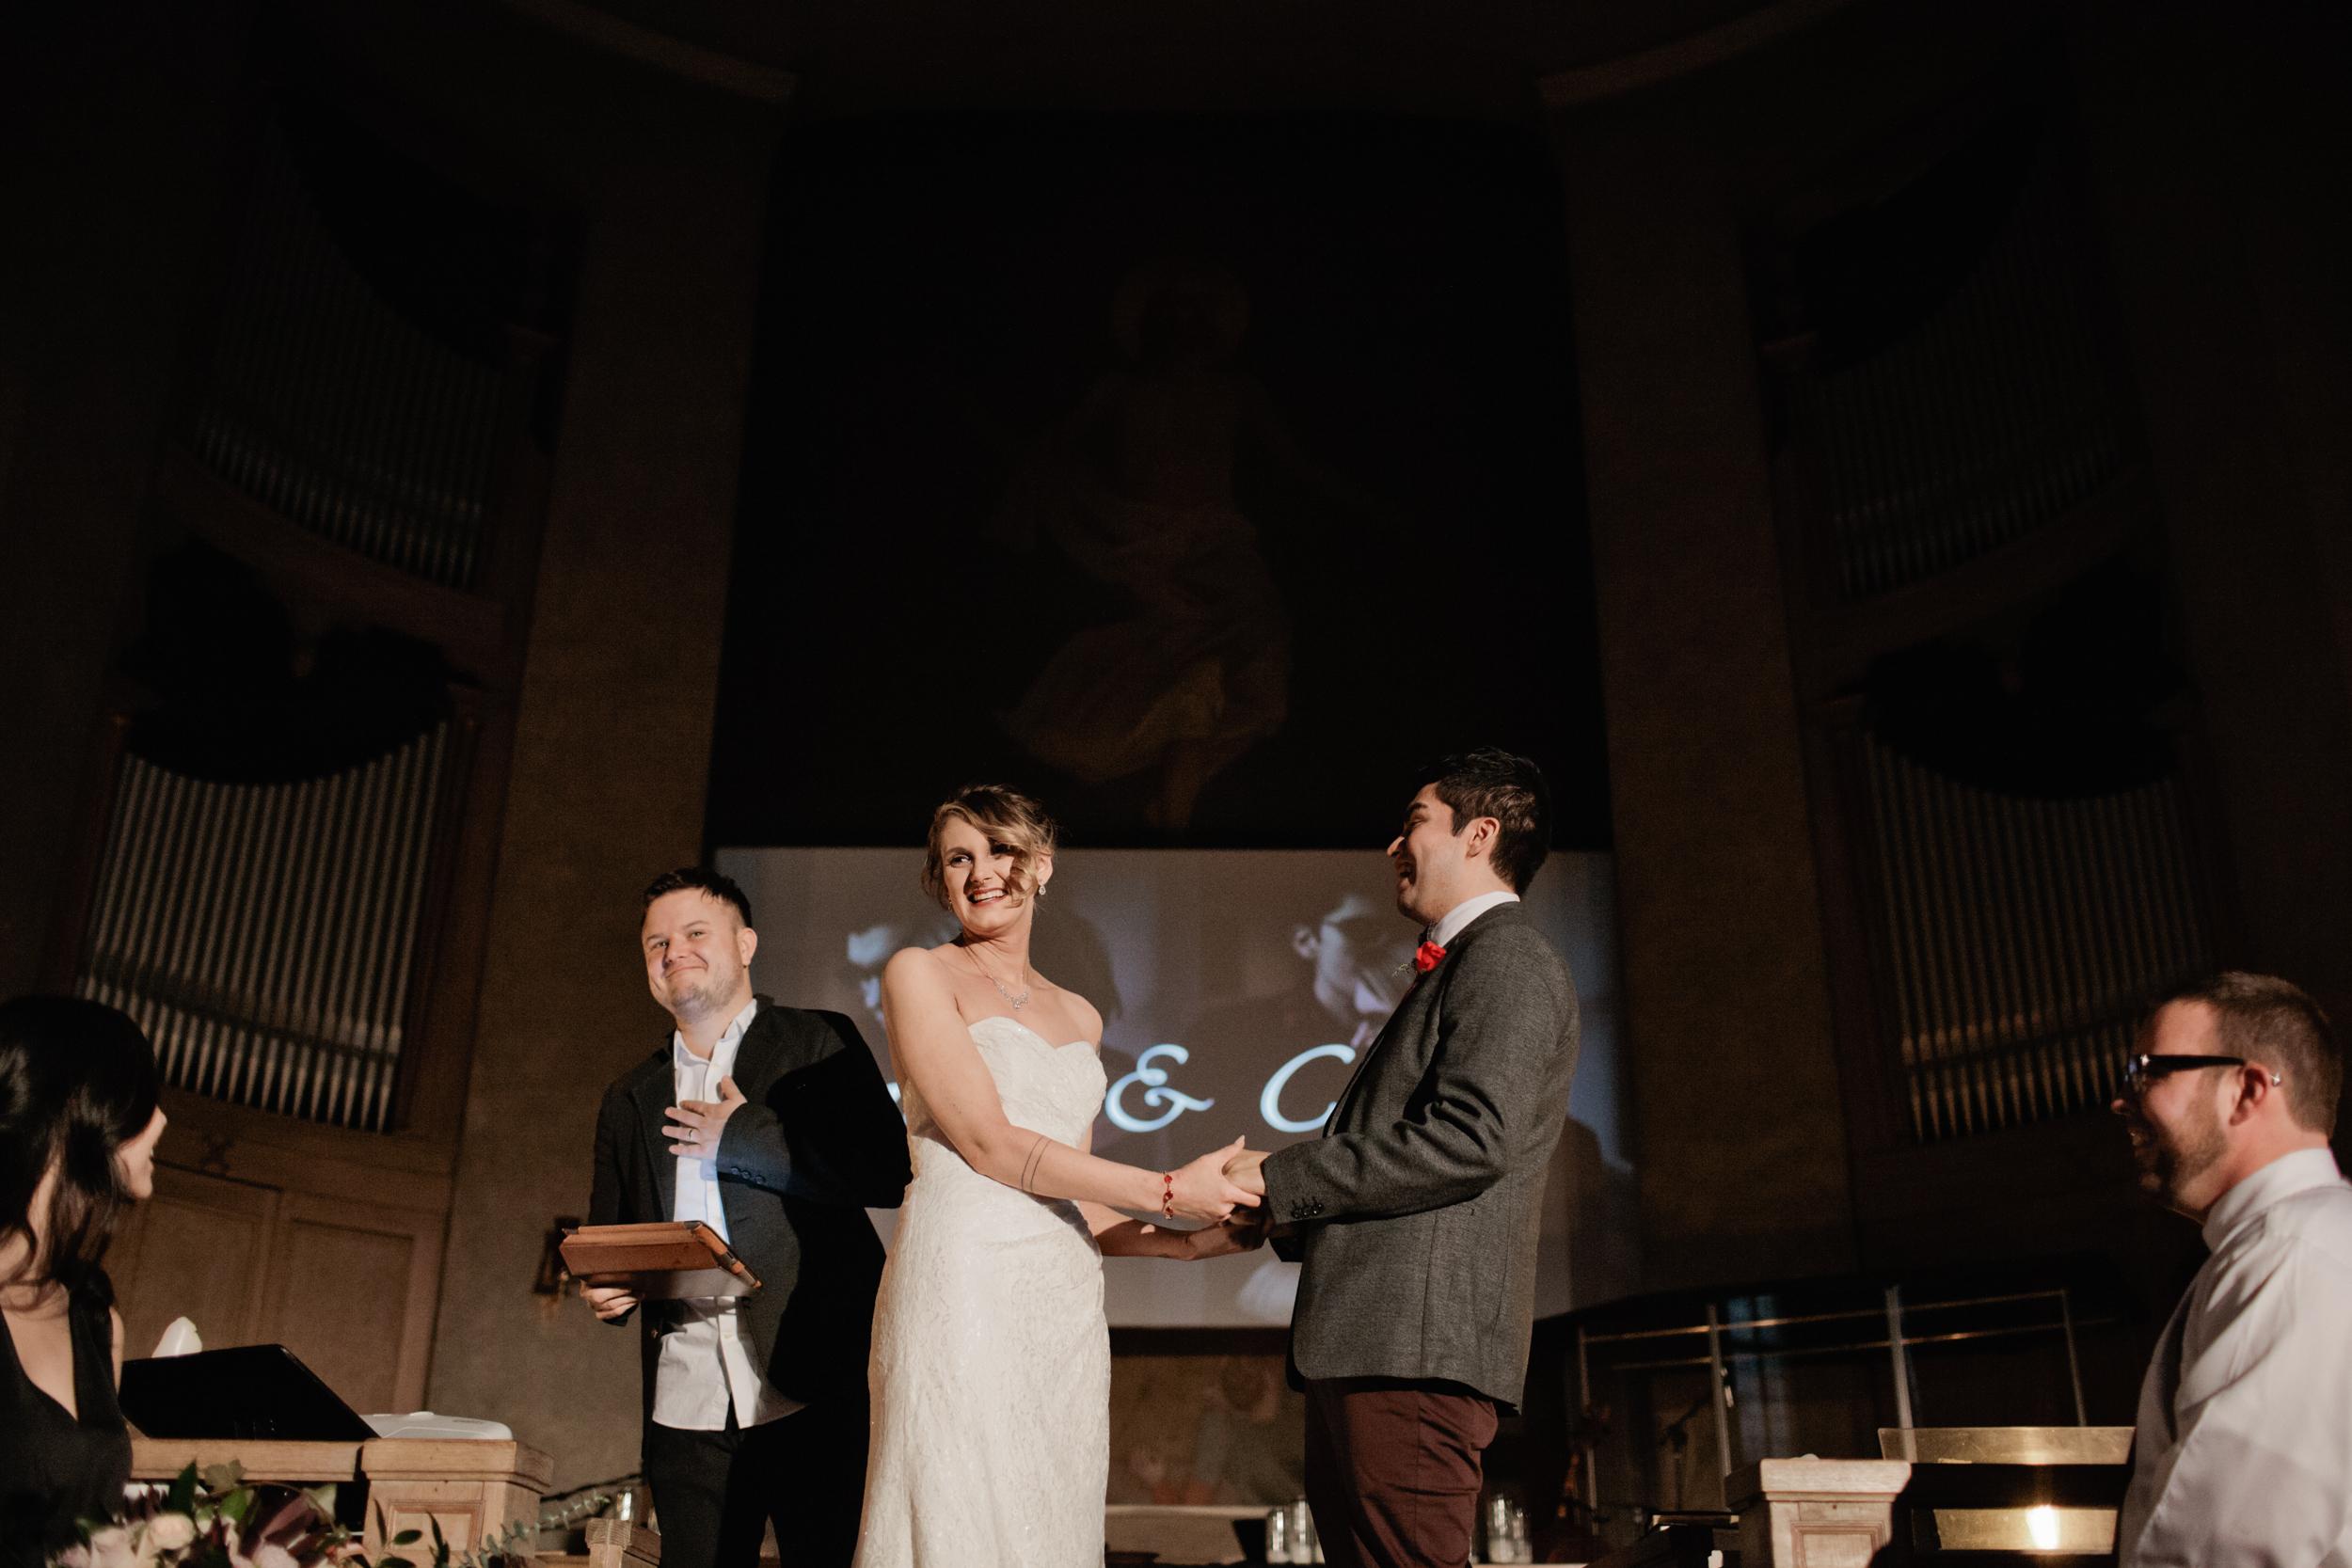 providence-wedding-photographer-93.jpg